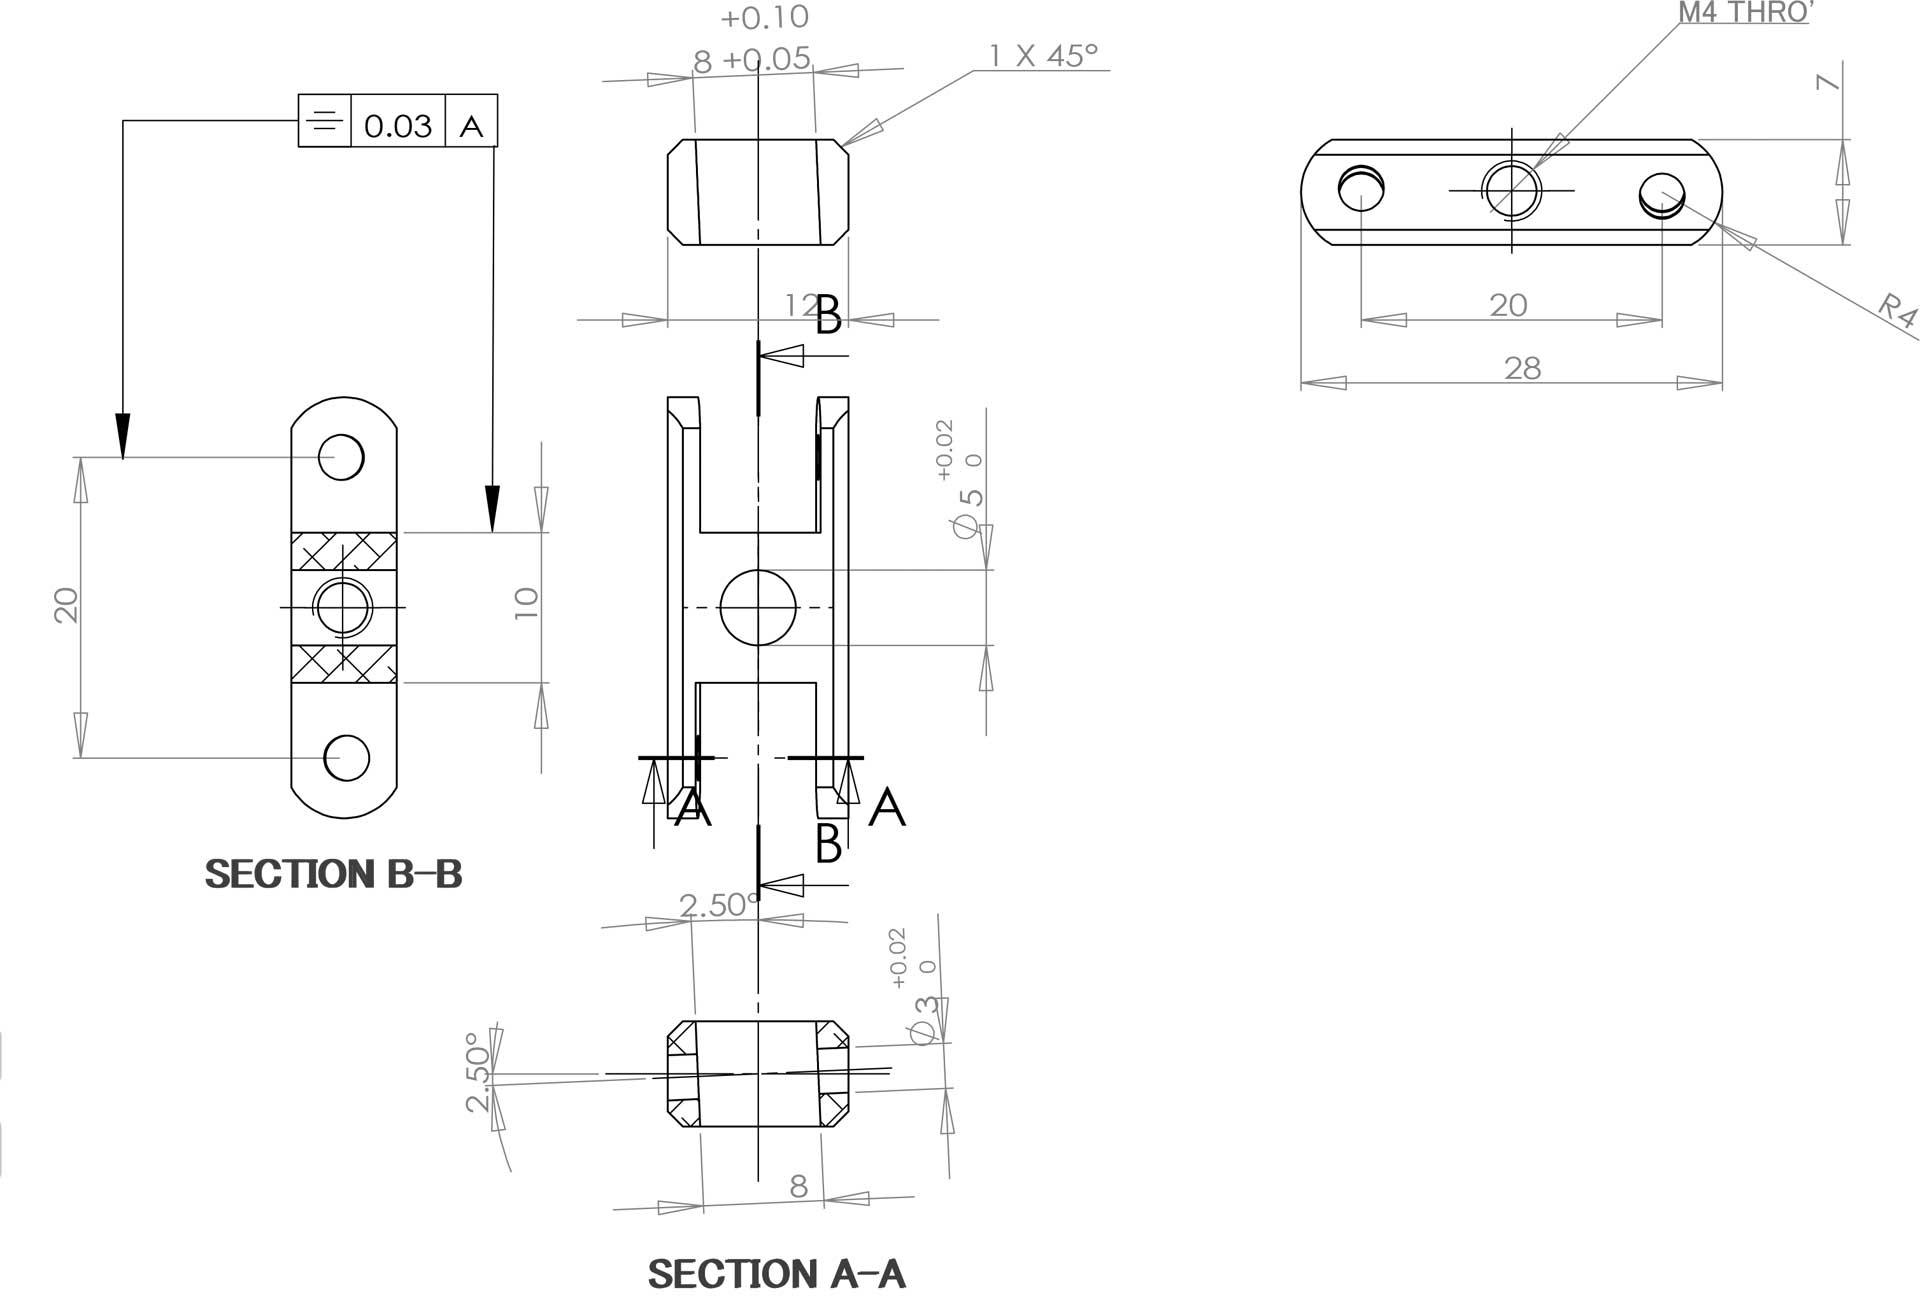 Robbe Modellsport avec telteil LS 3223/10, 20mm, 2,5°, 4mm